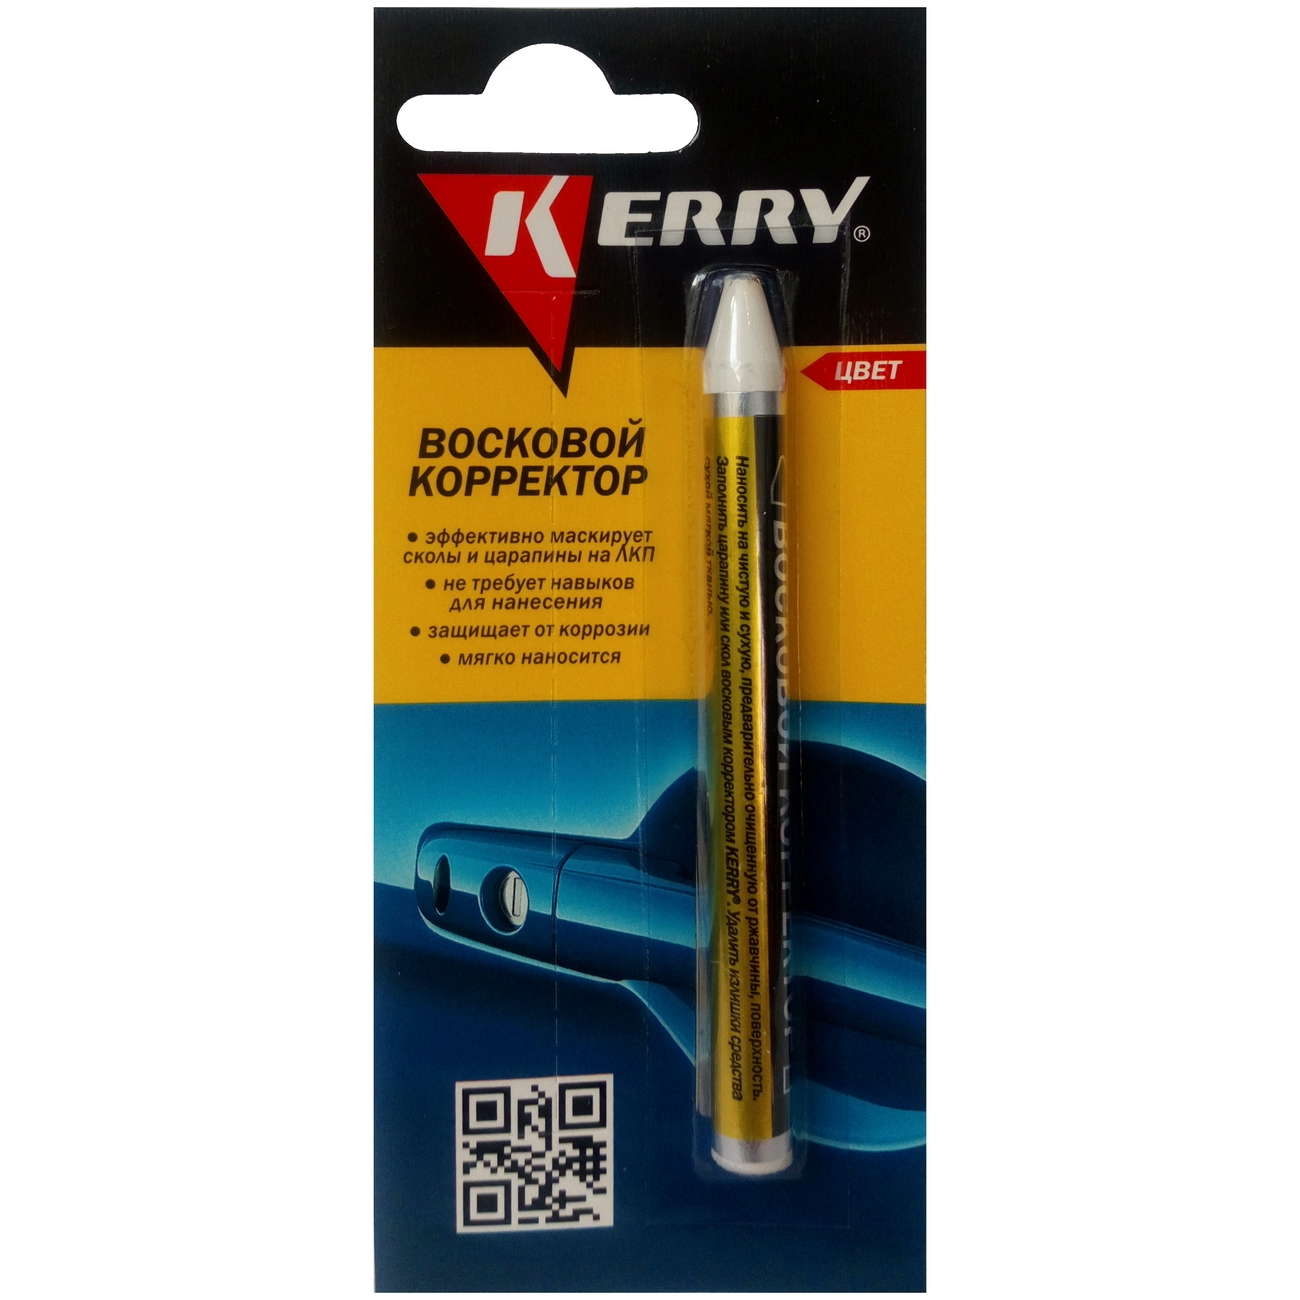 Средство для ремонта царапин KERRY восковый корректор, карандаш, белый KERRY